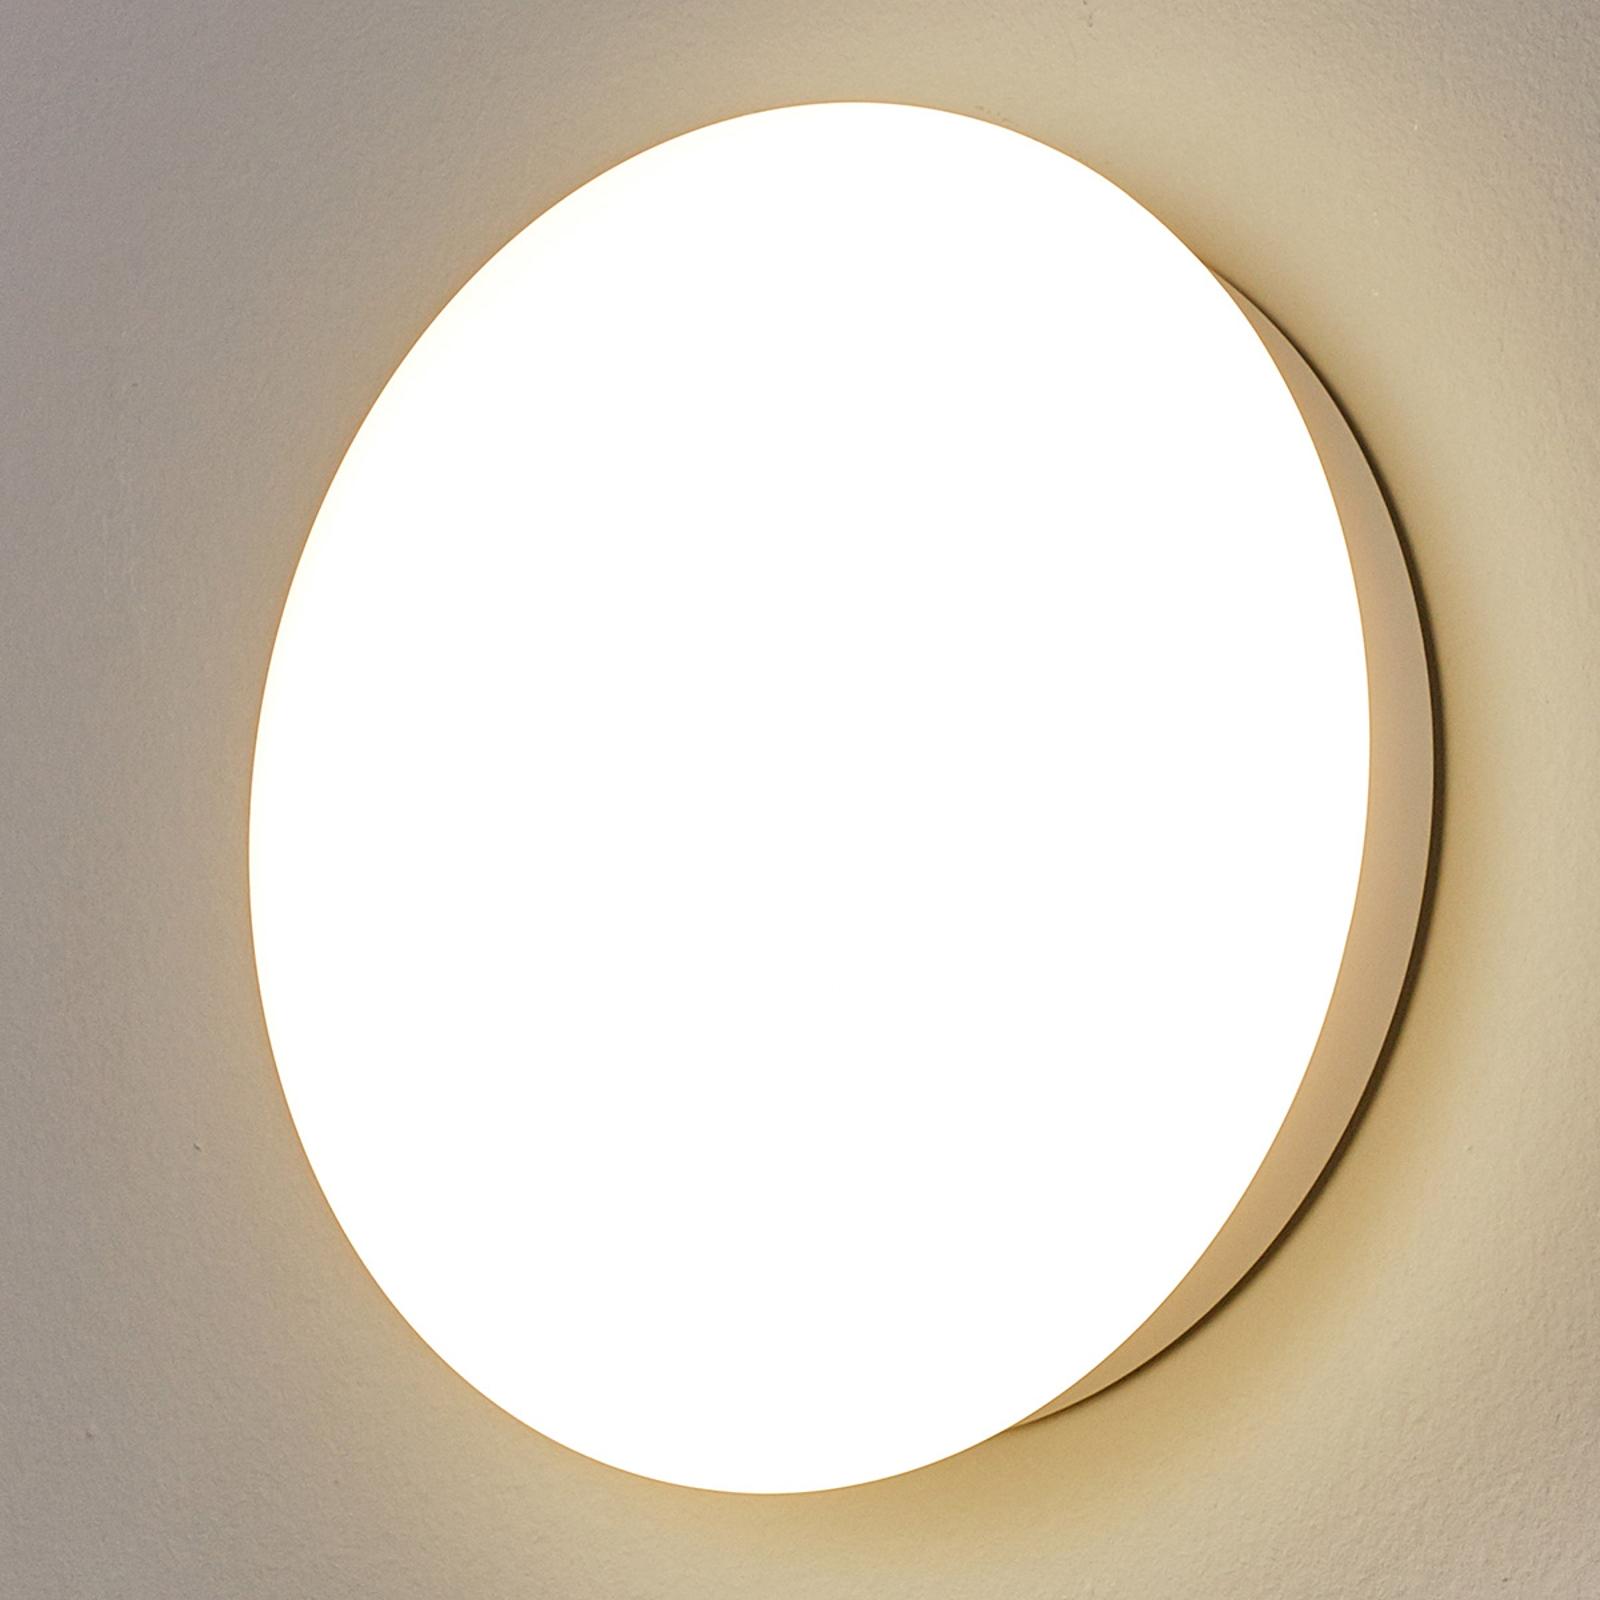 LED-vägglampa Sun 12 IP55, 8W 3000K vv